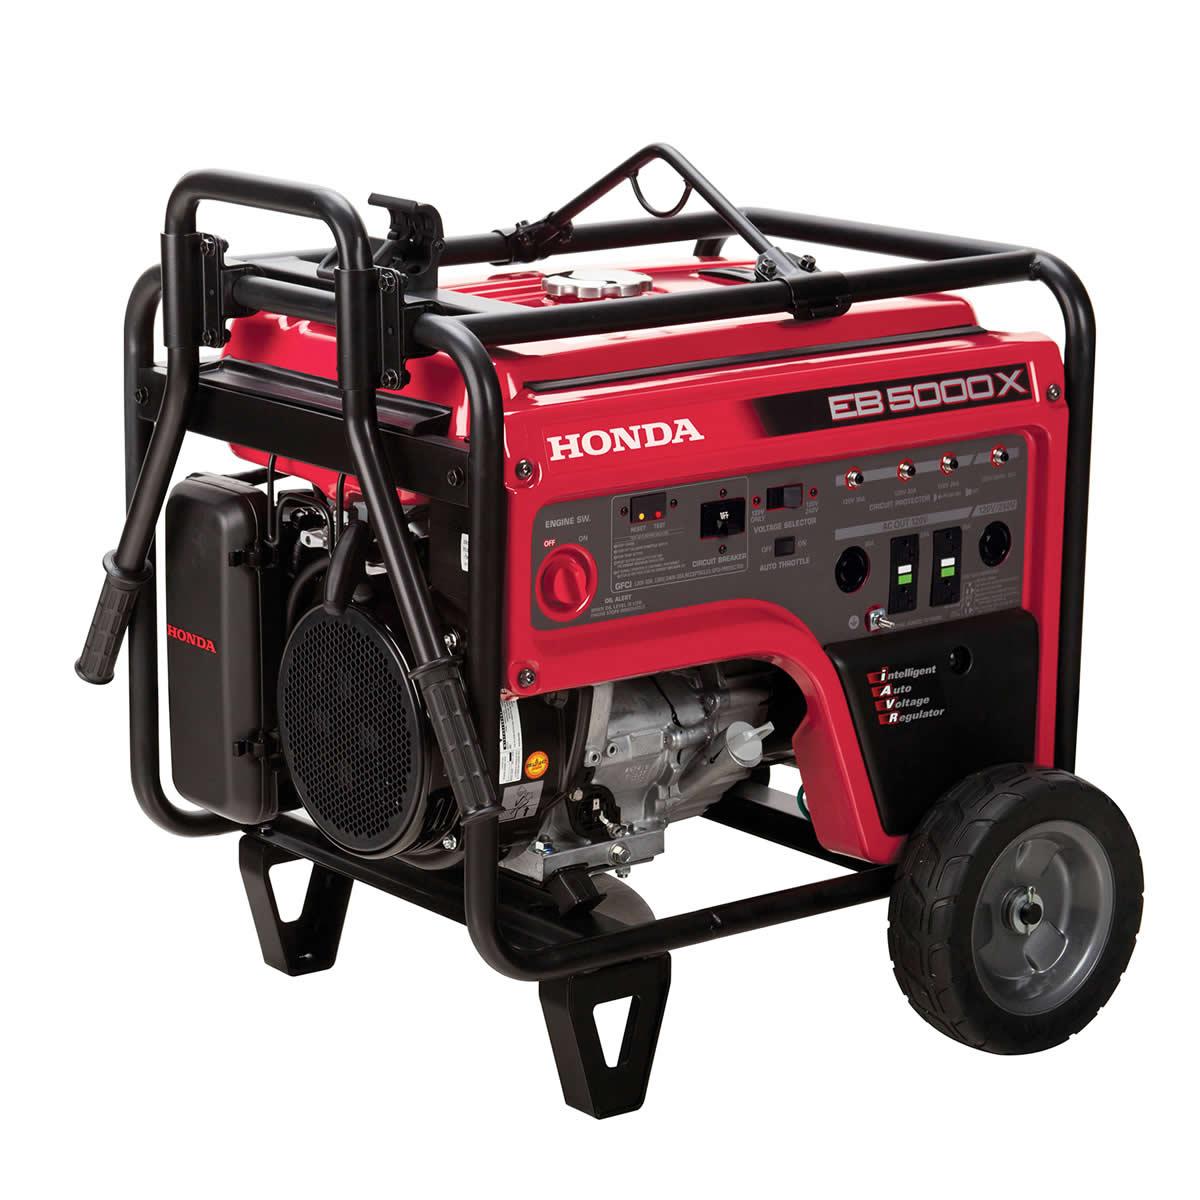 Picture of Honda EB Series EB5000XK3AT1 Portable Generator, 37.5/18.8 A, 120/240 V, Gasoline, 6.2 gal Tank, 8.1 hr Run Time